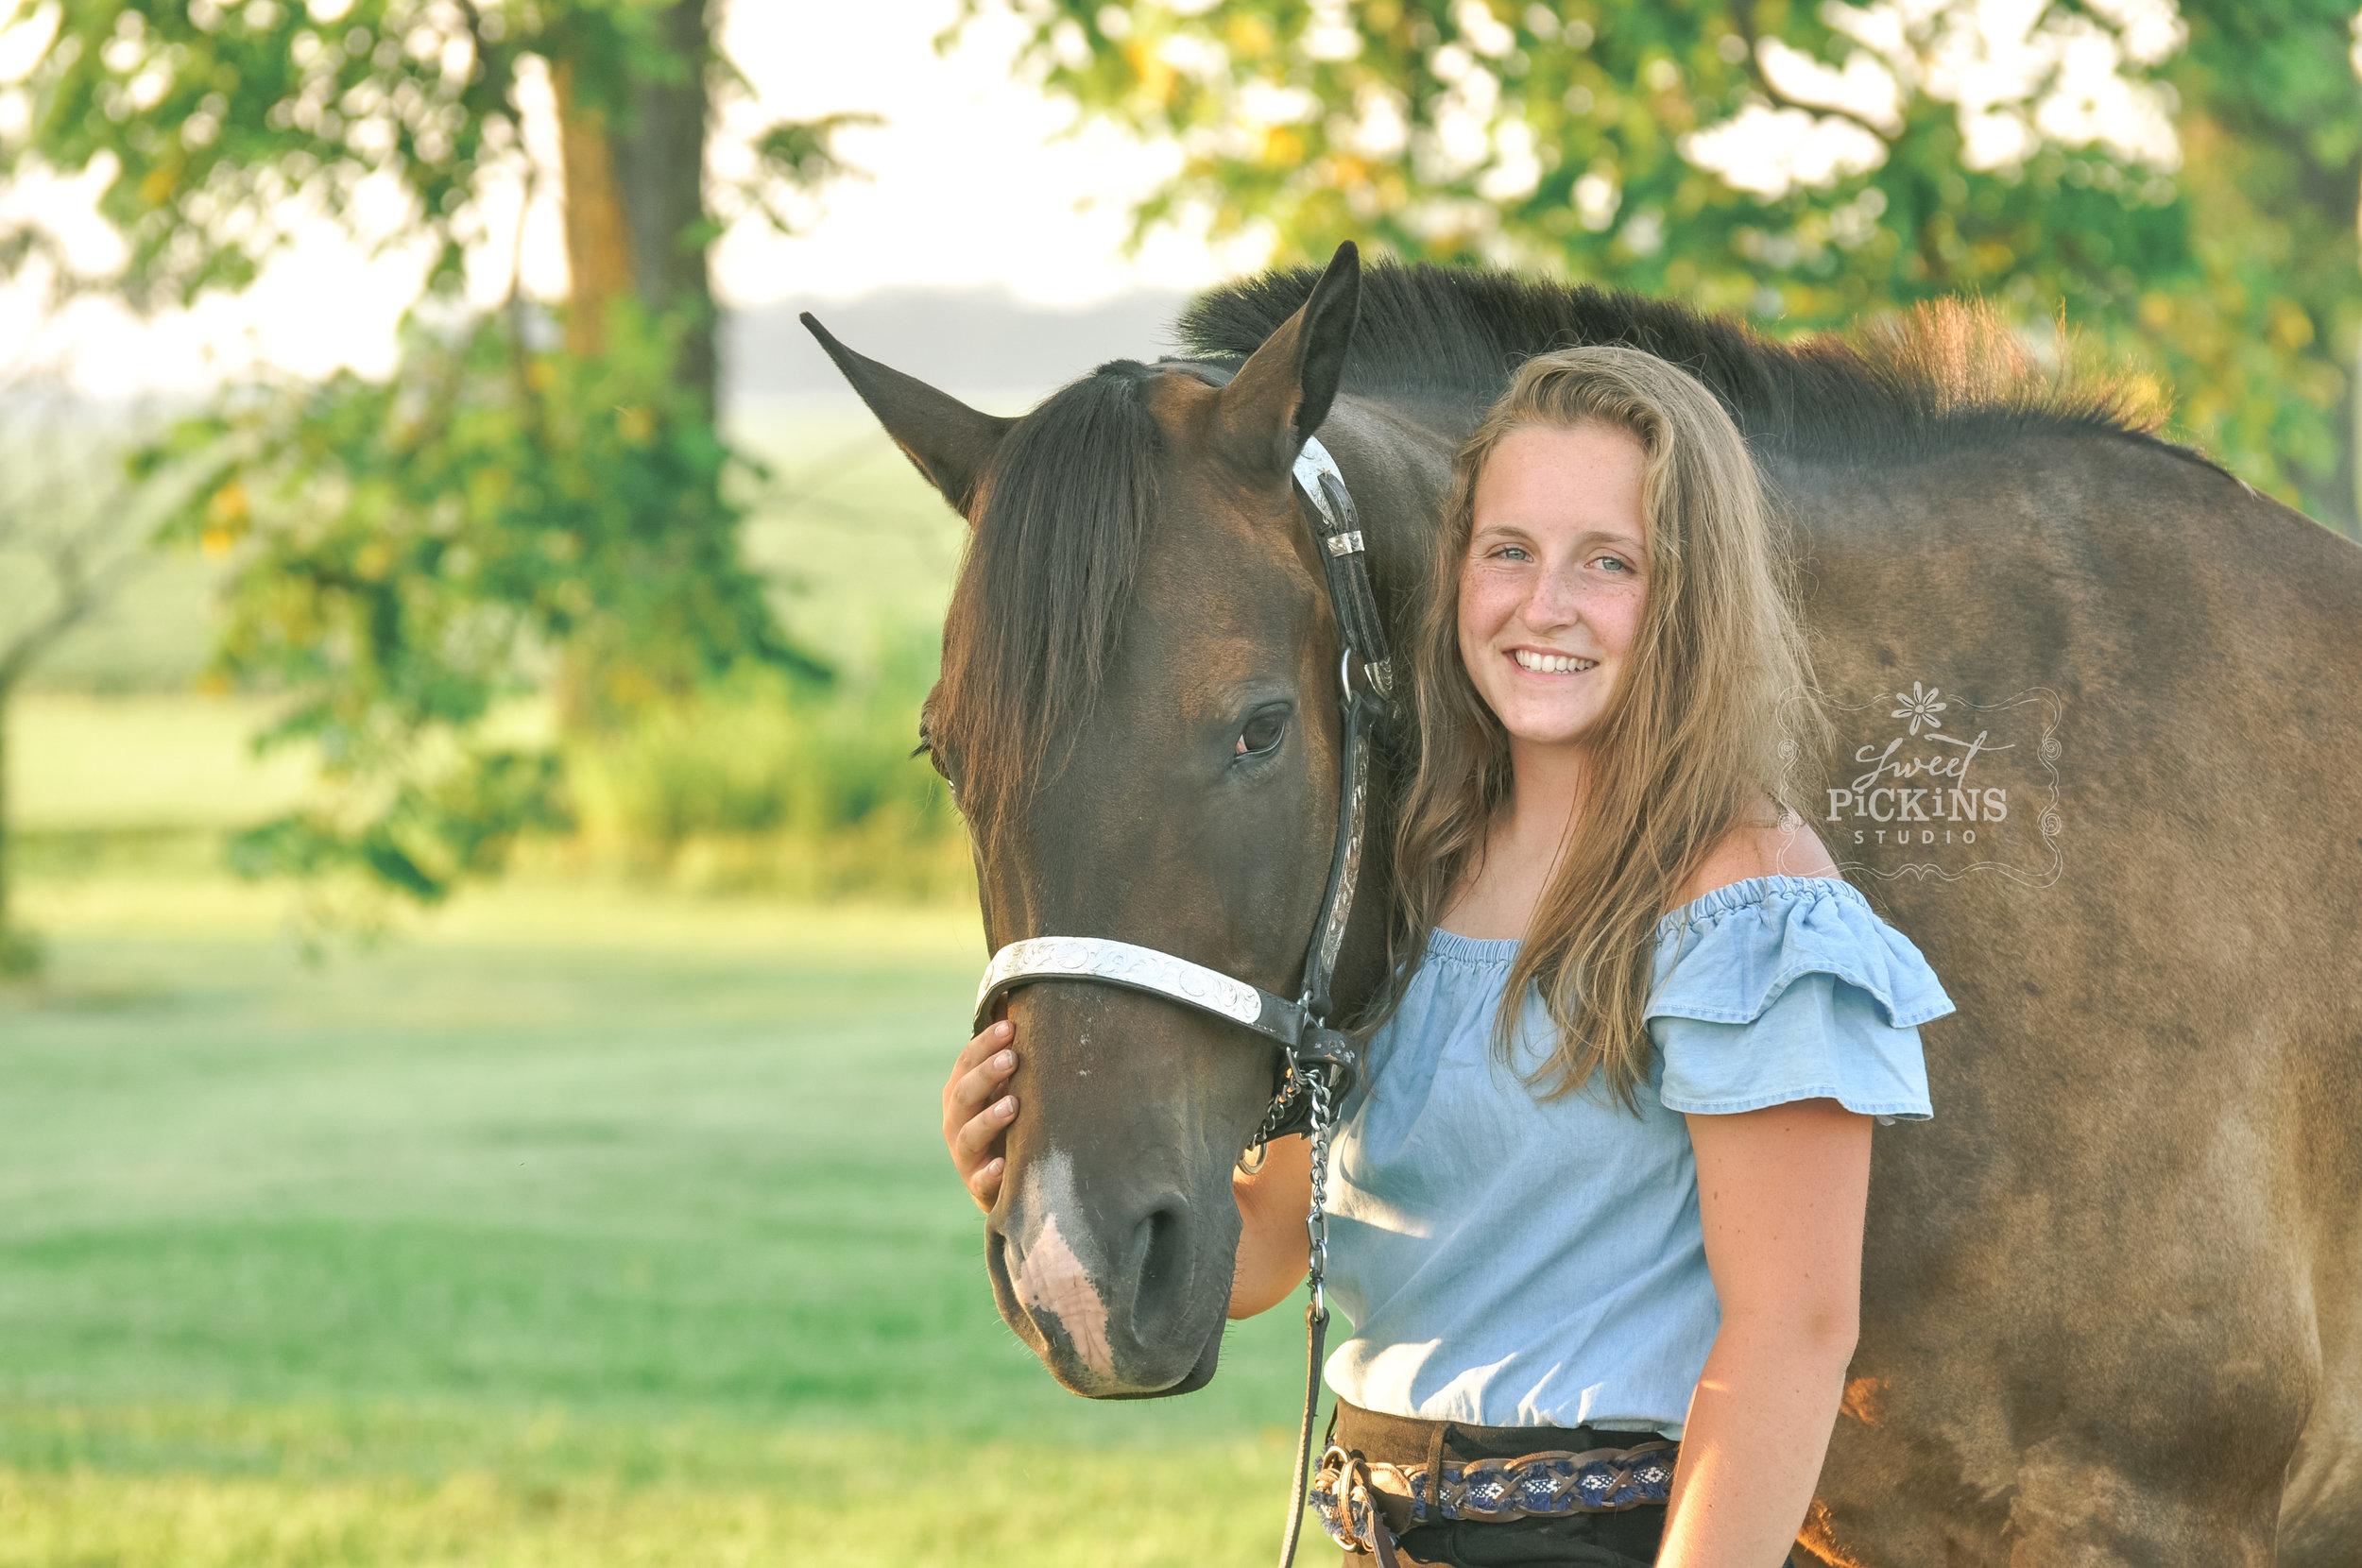 Peru, Indiana Equine Portrait Session